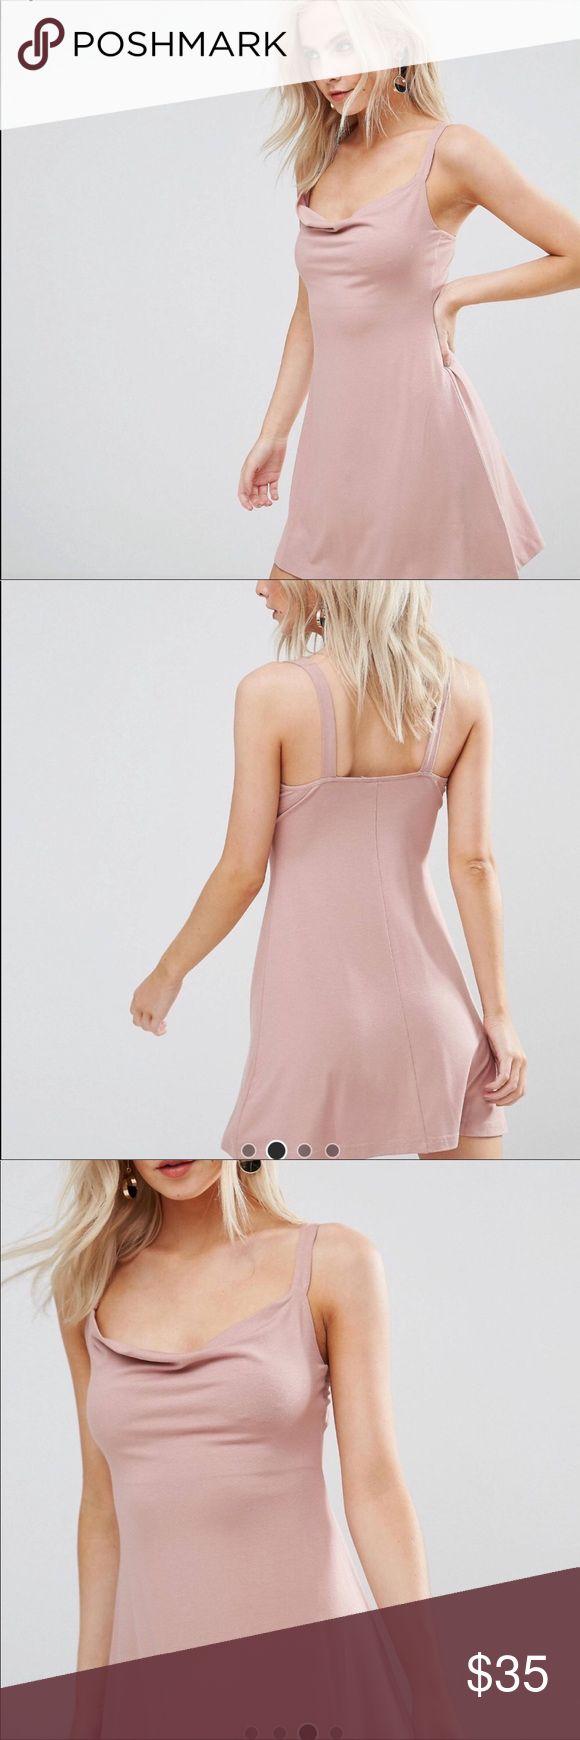 ASOS PETITE Mini Cowl Swing Dress * New without tag. No flaws. ASOS Petite Dresses Mini